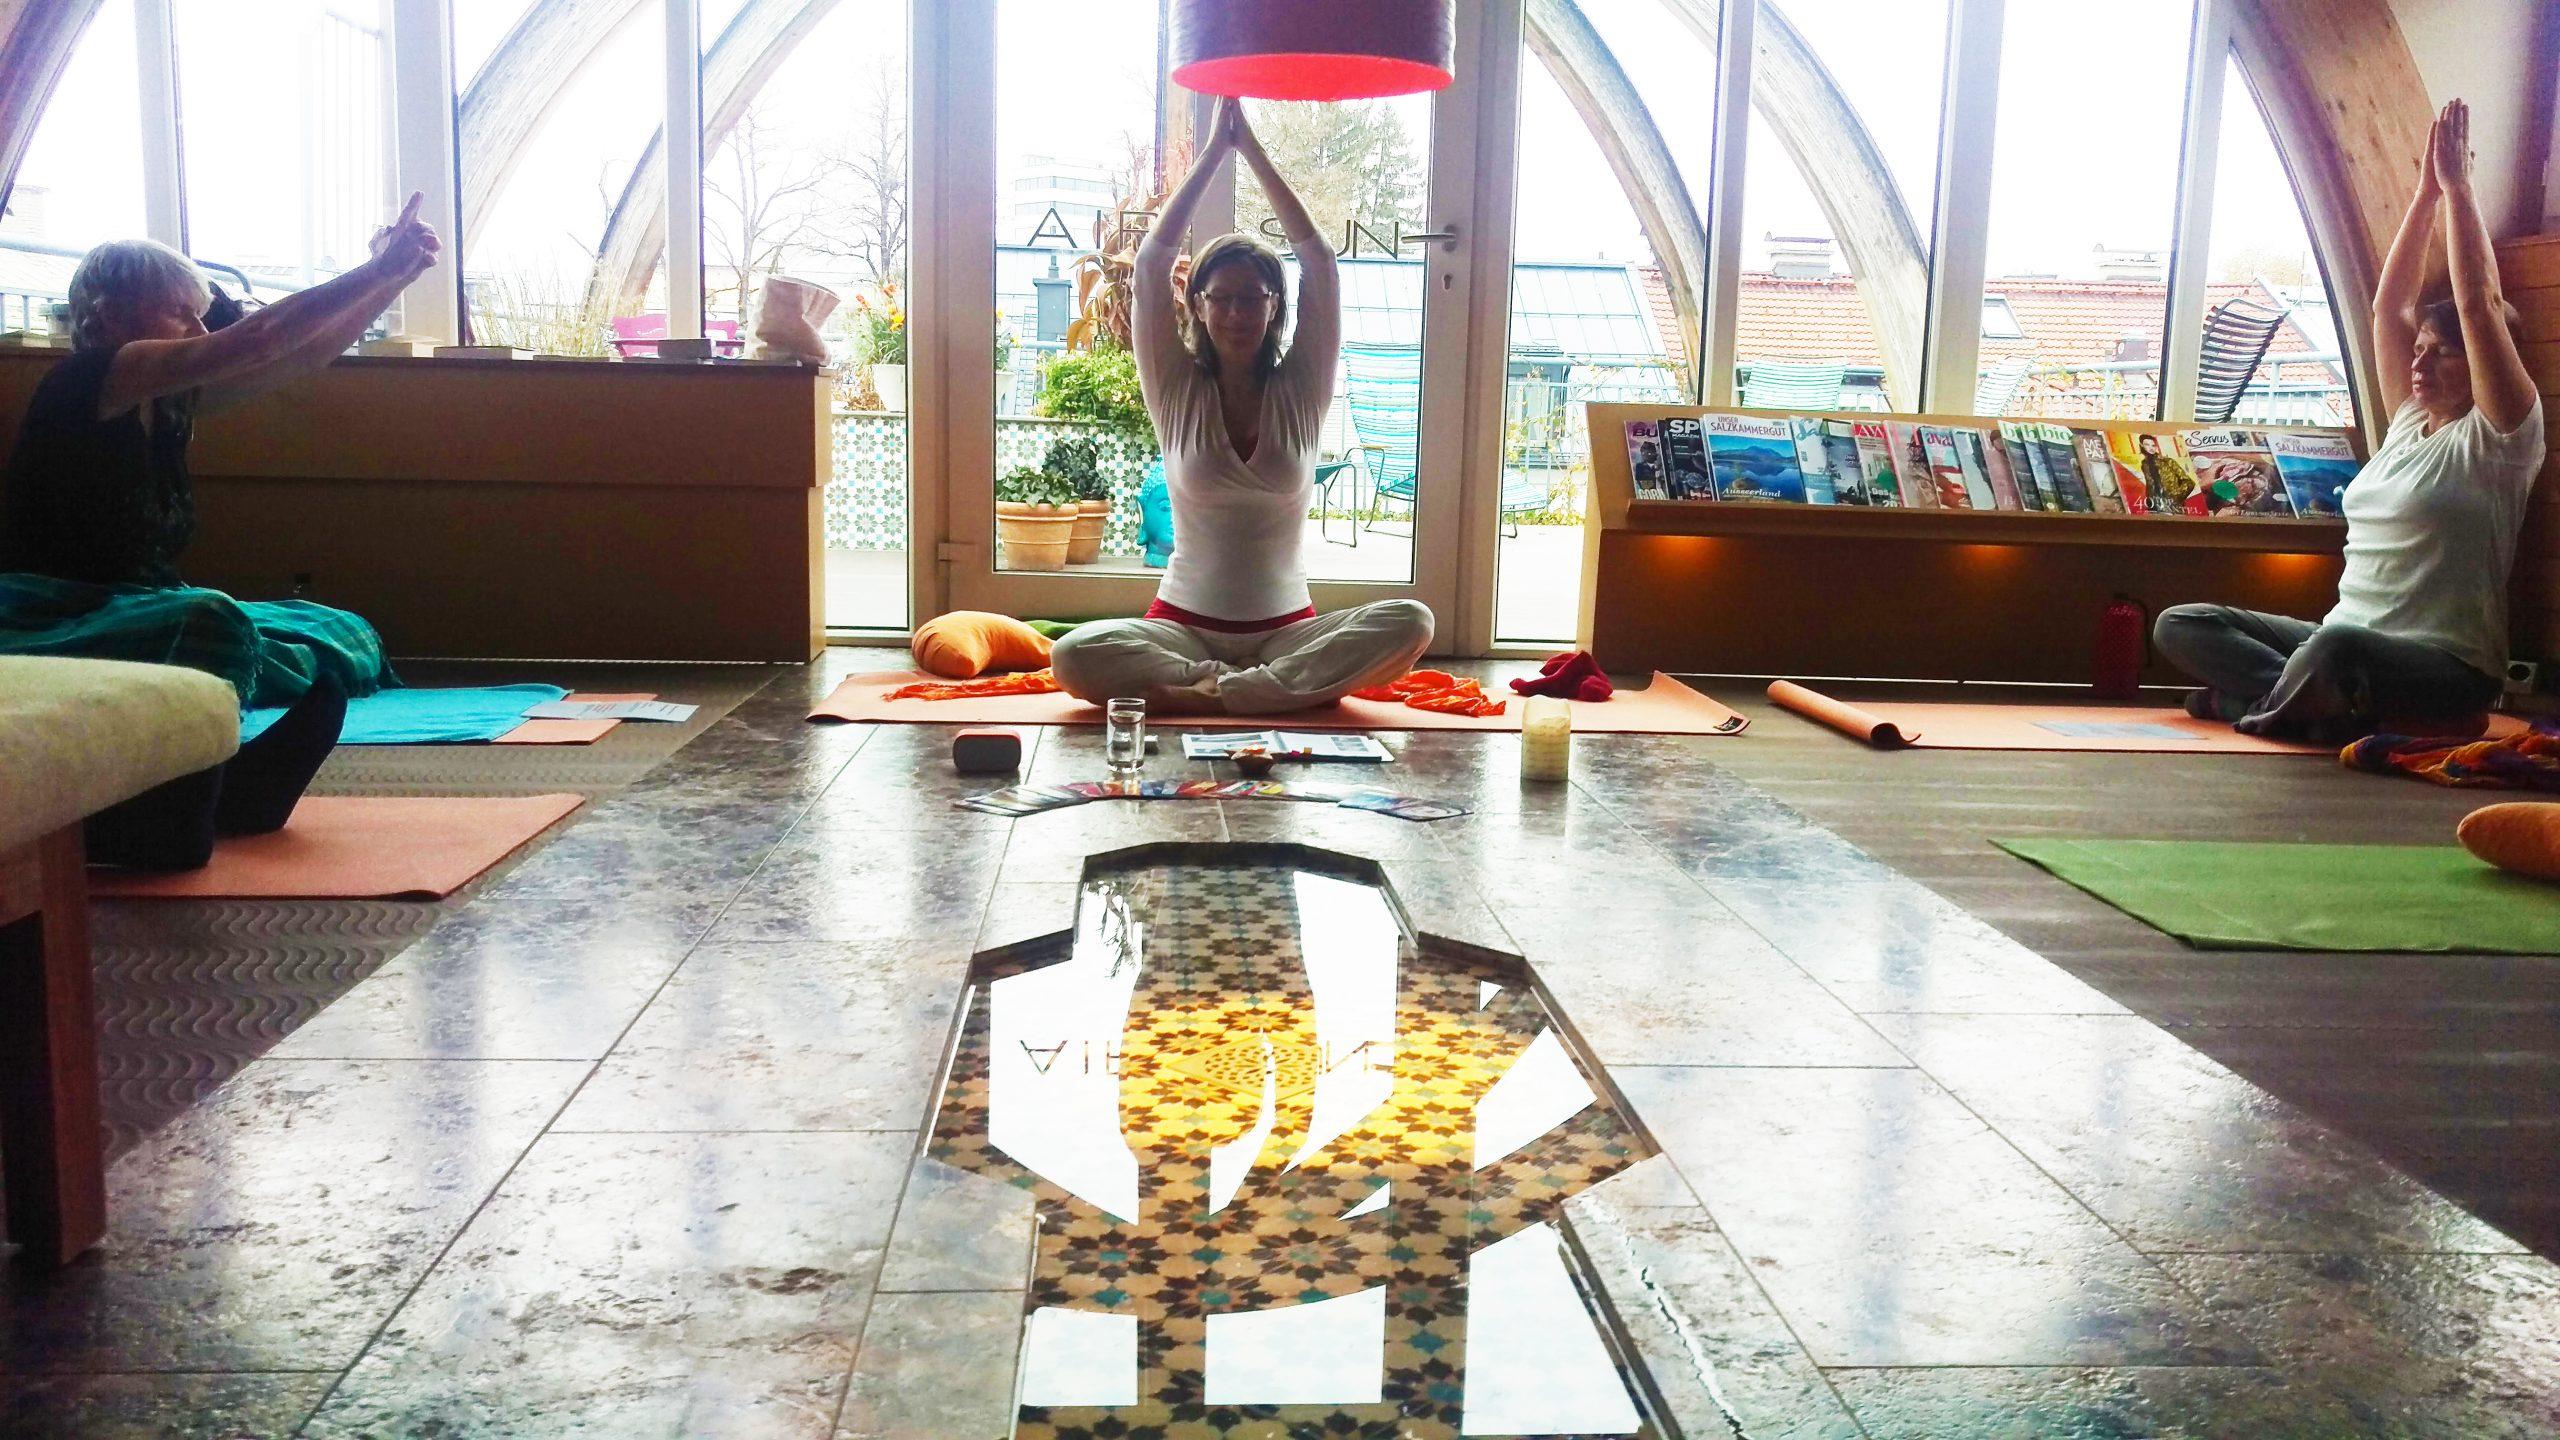 Chefredakteurin Michaela Gründler leitet die Yoga-Gruppe.